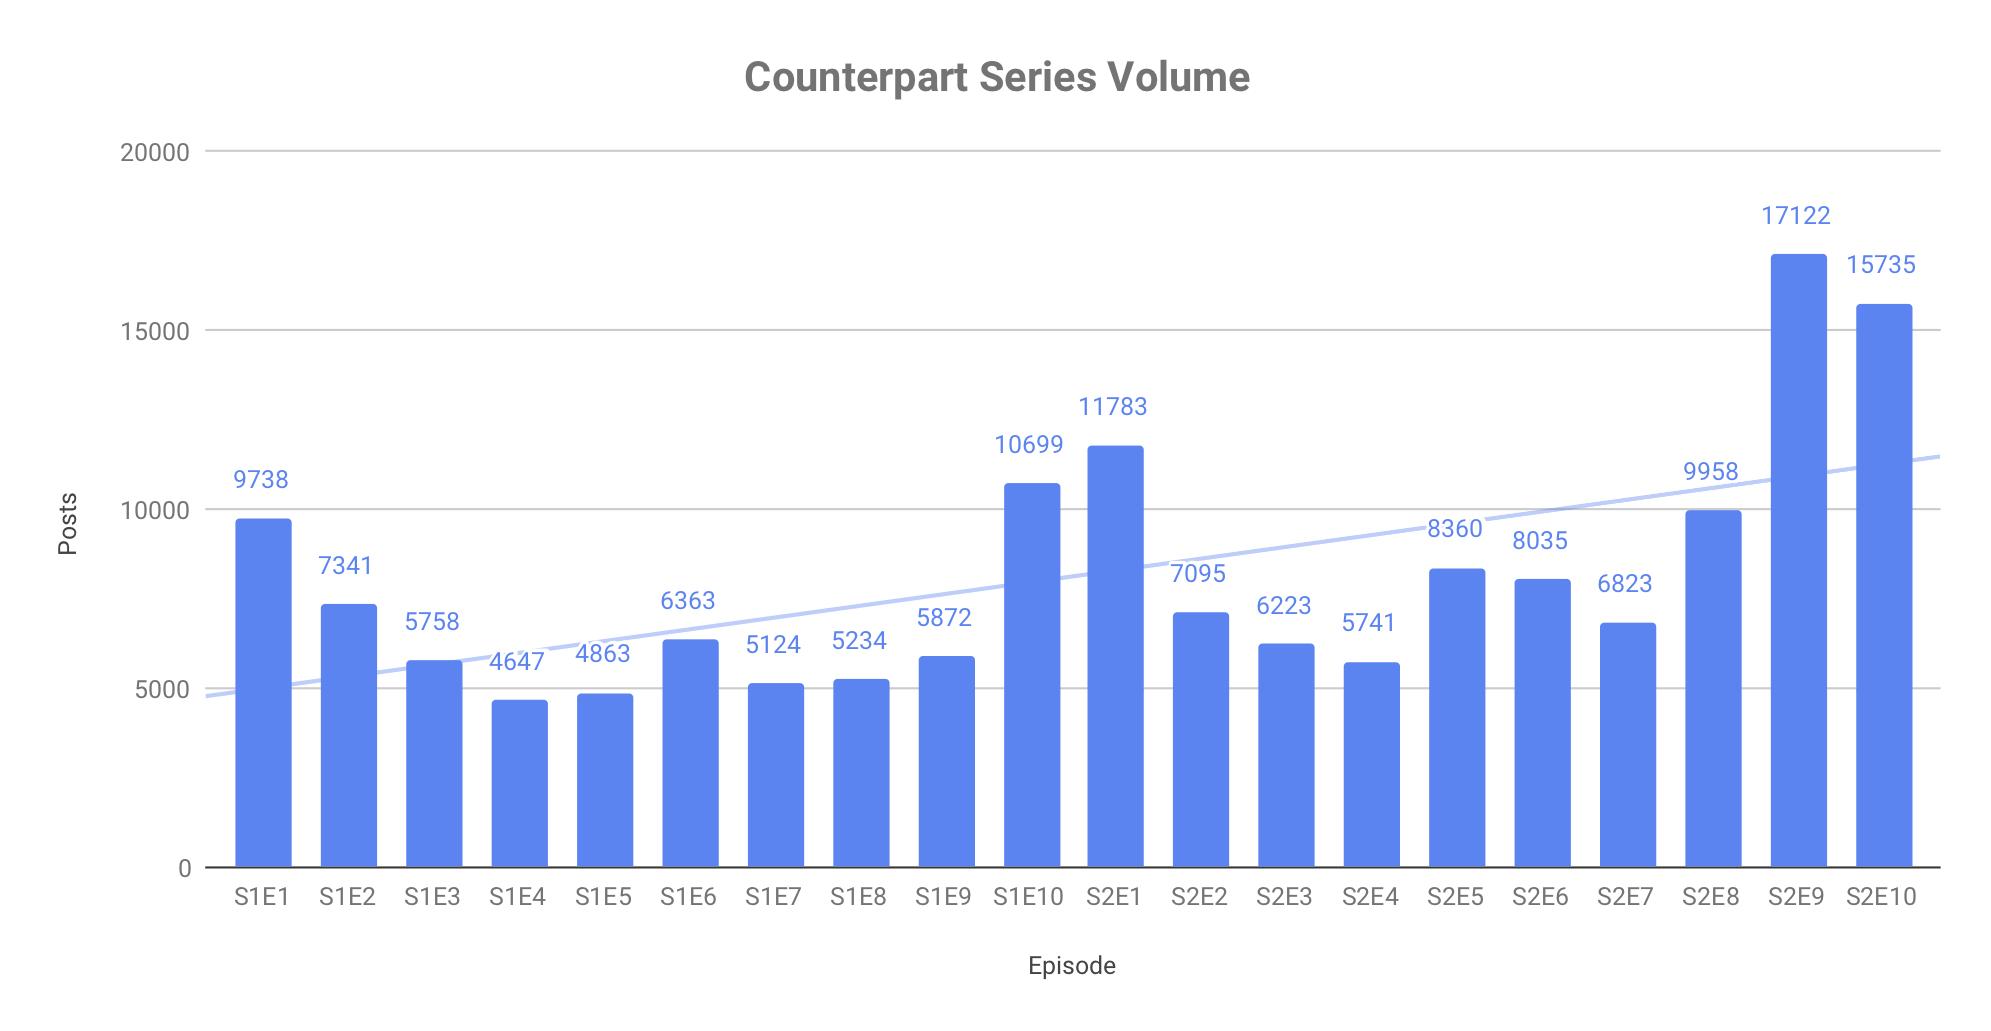 Counterpart Series VolumeFINAL.jpg